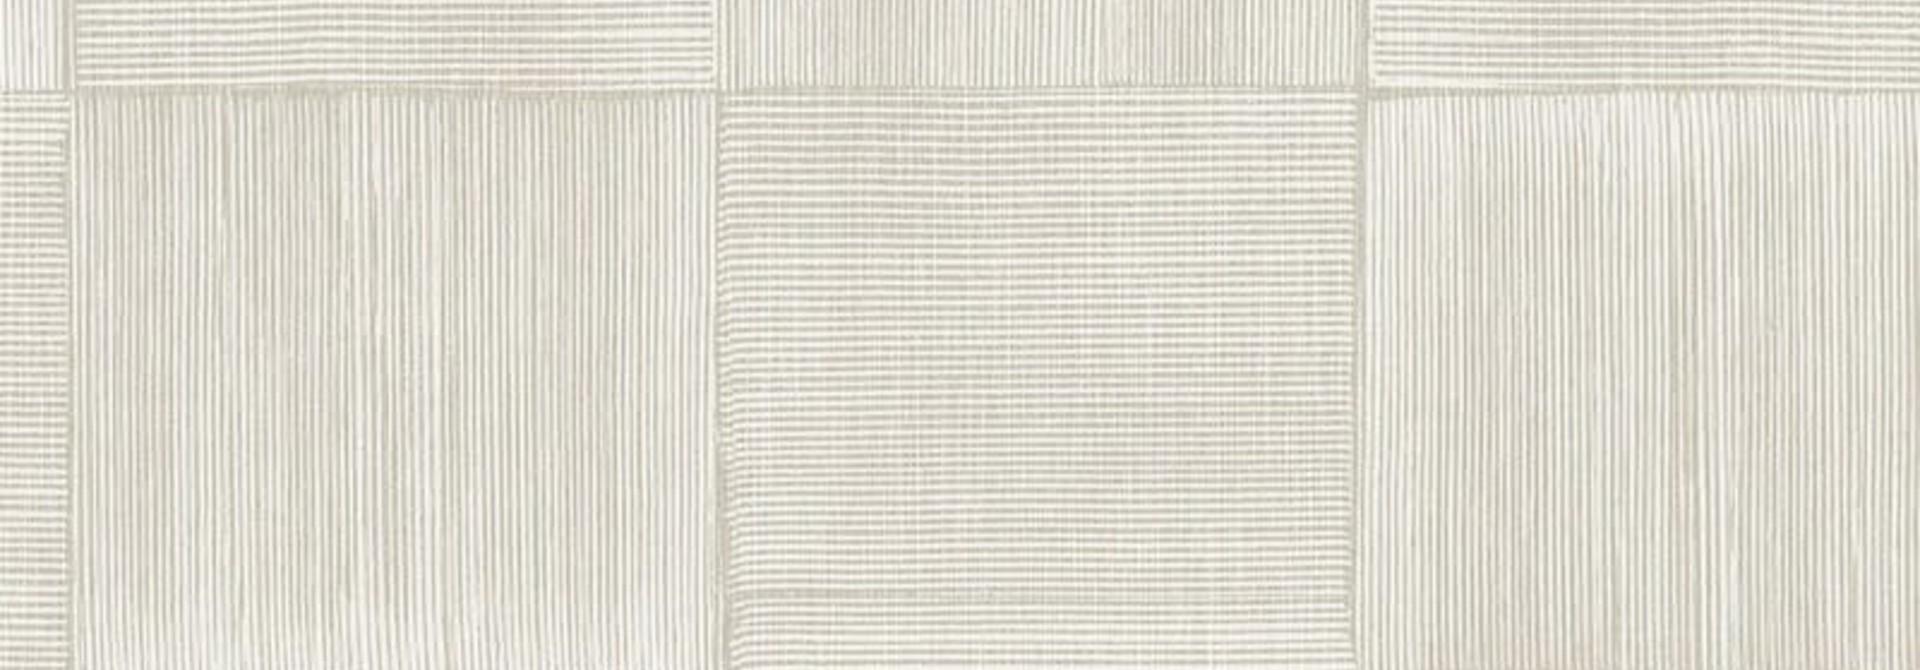 Behang 5023 Stro